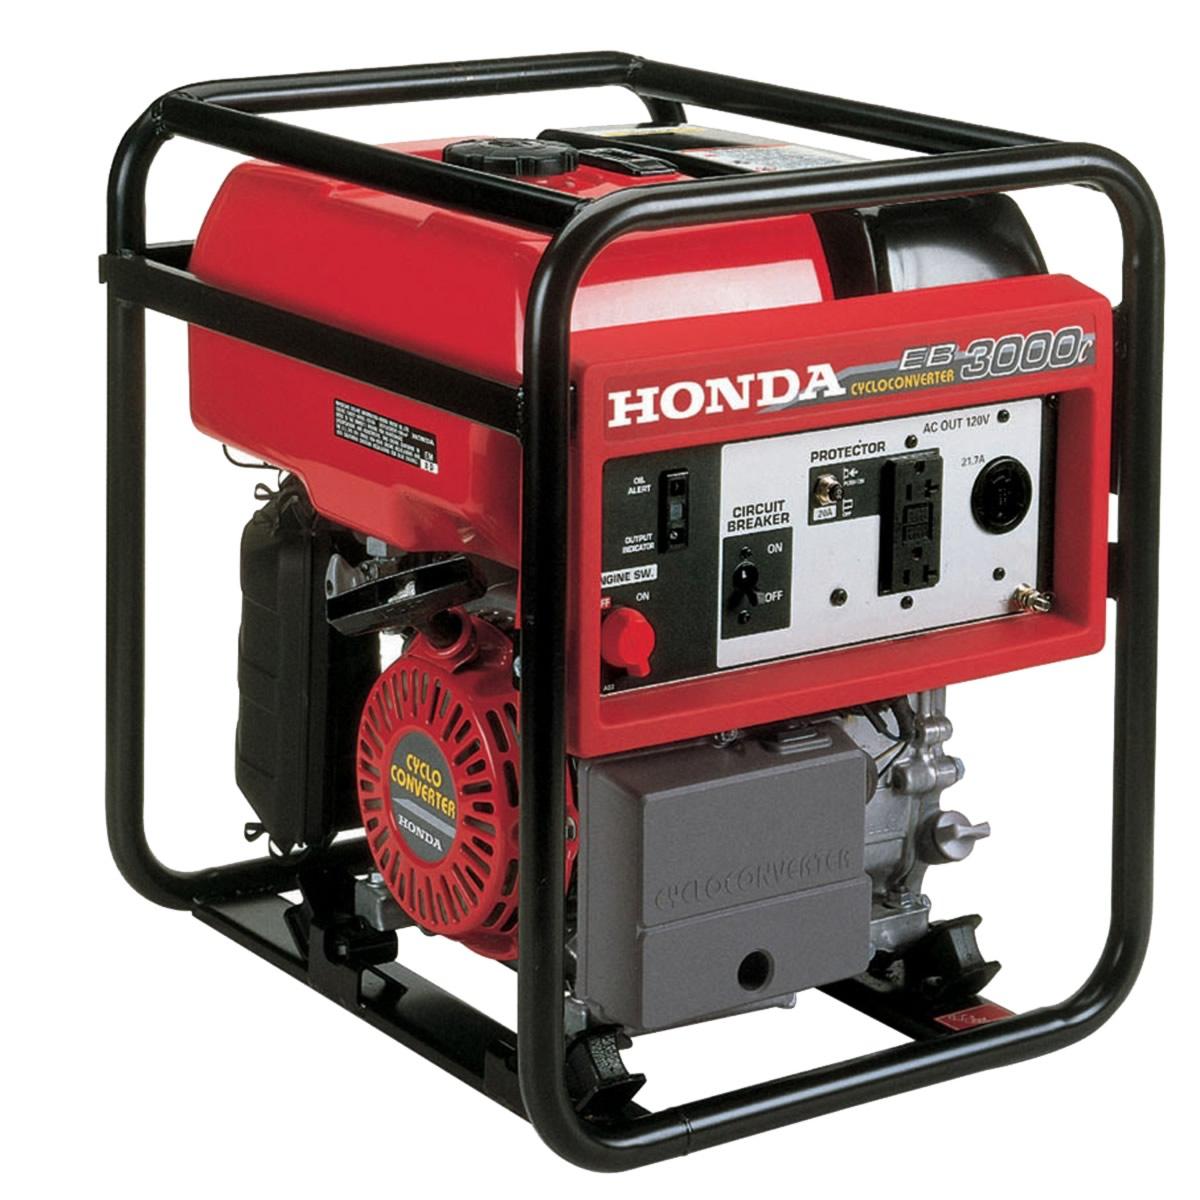 honda ev6010 wiring diagram honda eb3000 generator parts  honda eb3000 generator parts